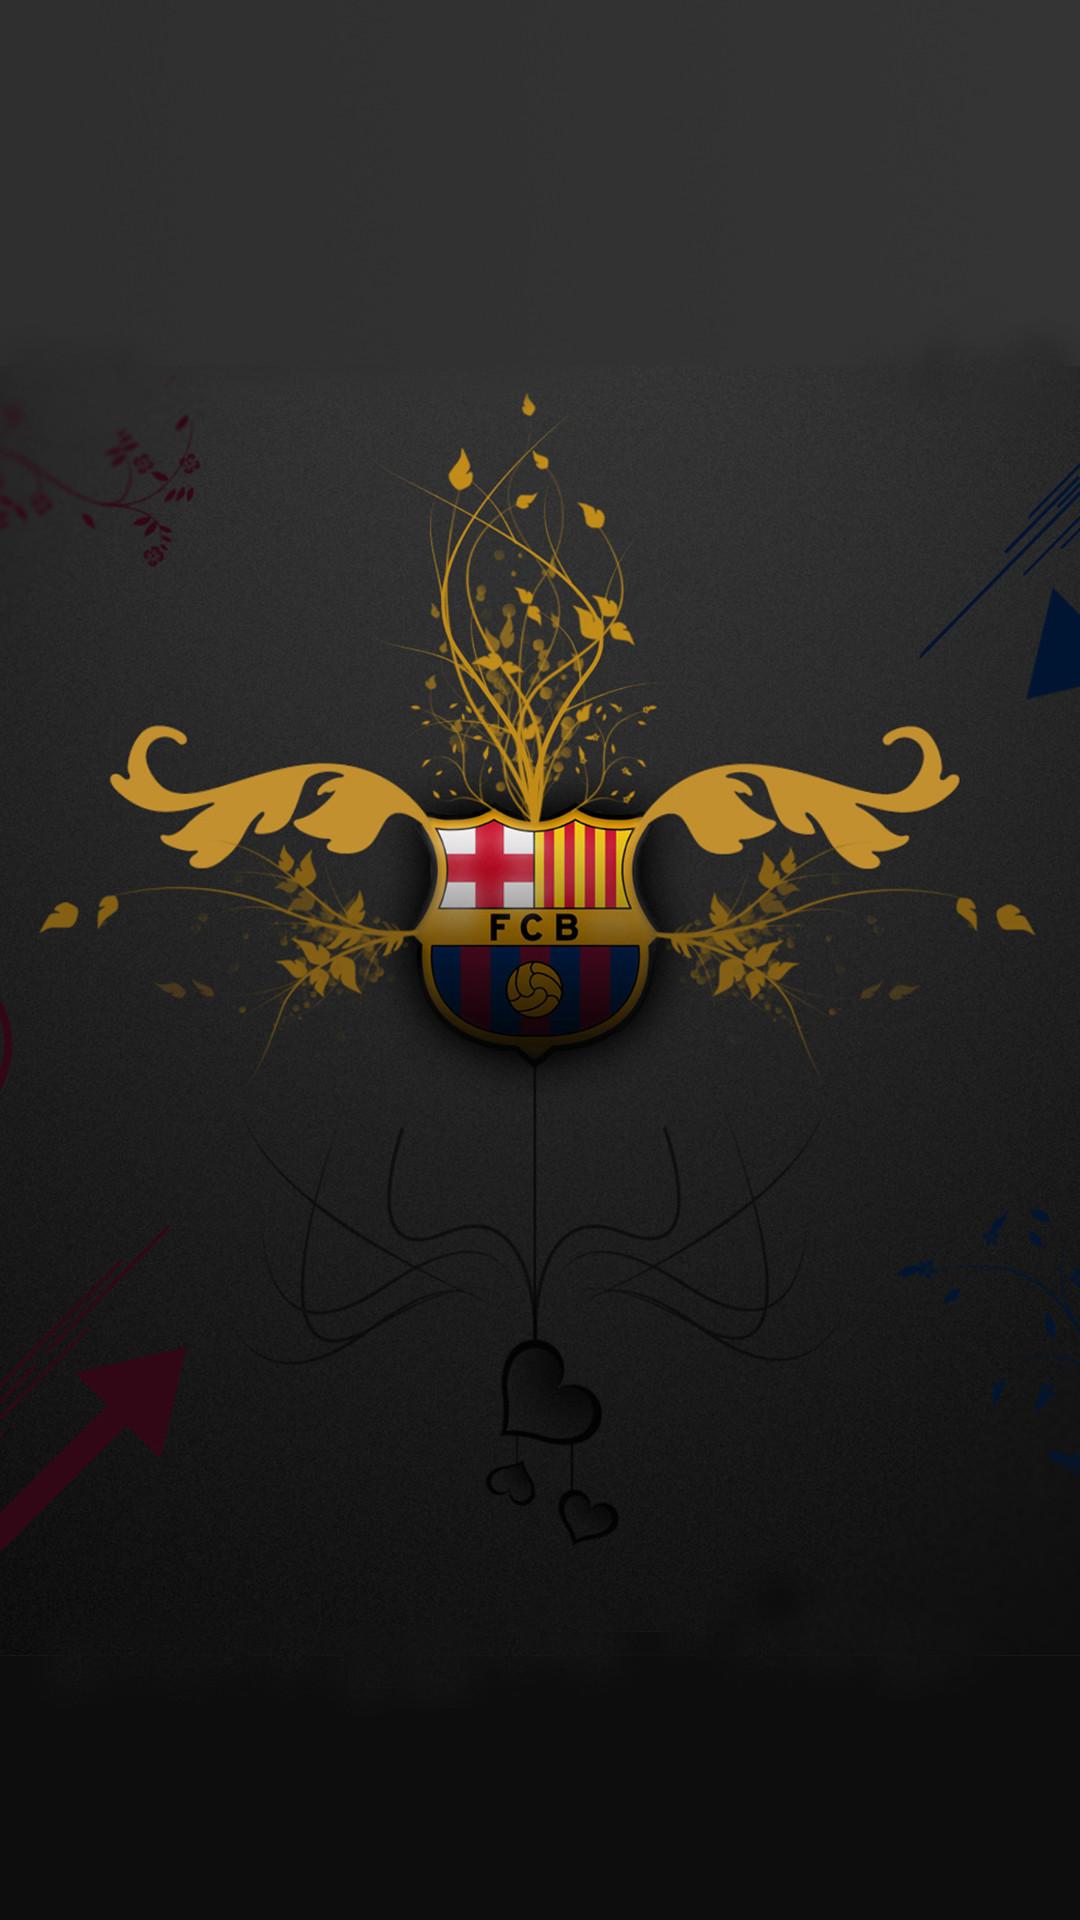 File attachment for Artistic FC Barcelona Logo of Apple iPhone 6s Plus  Wallpaper